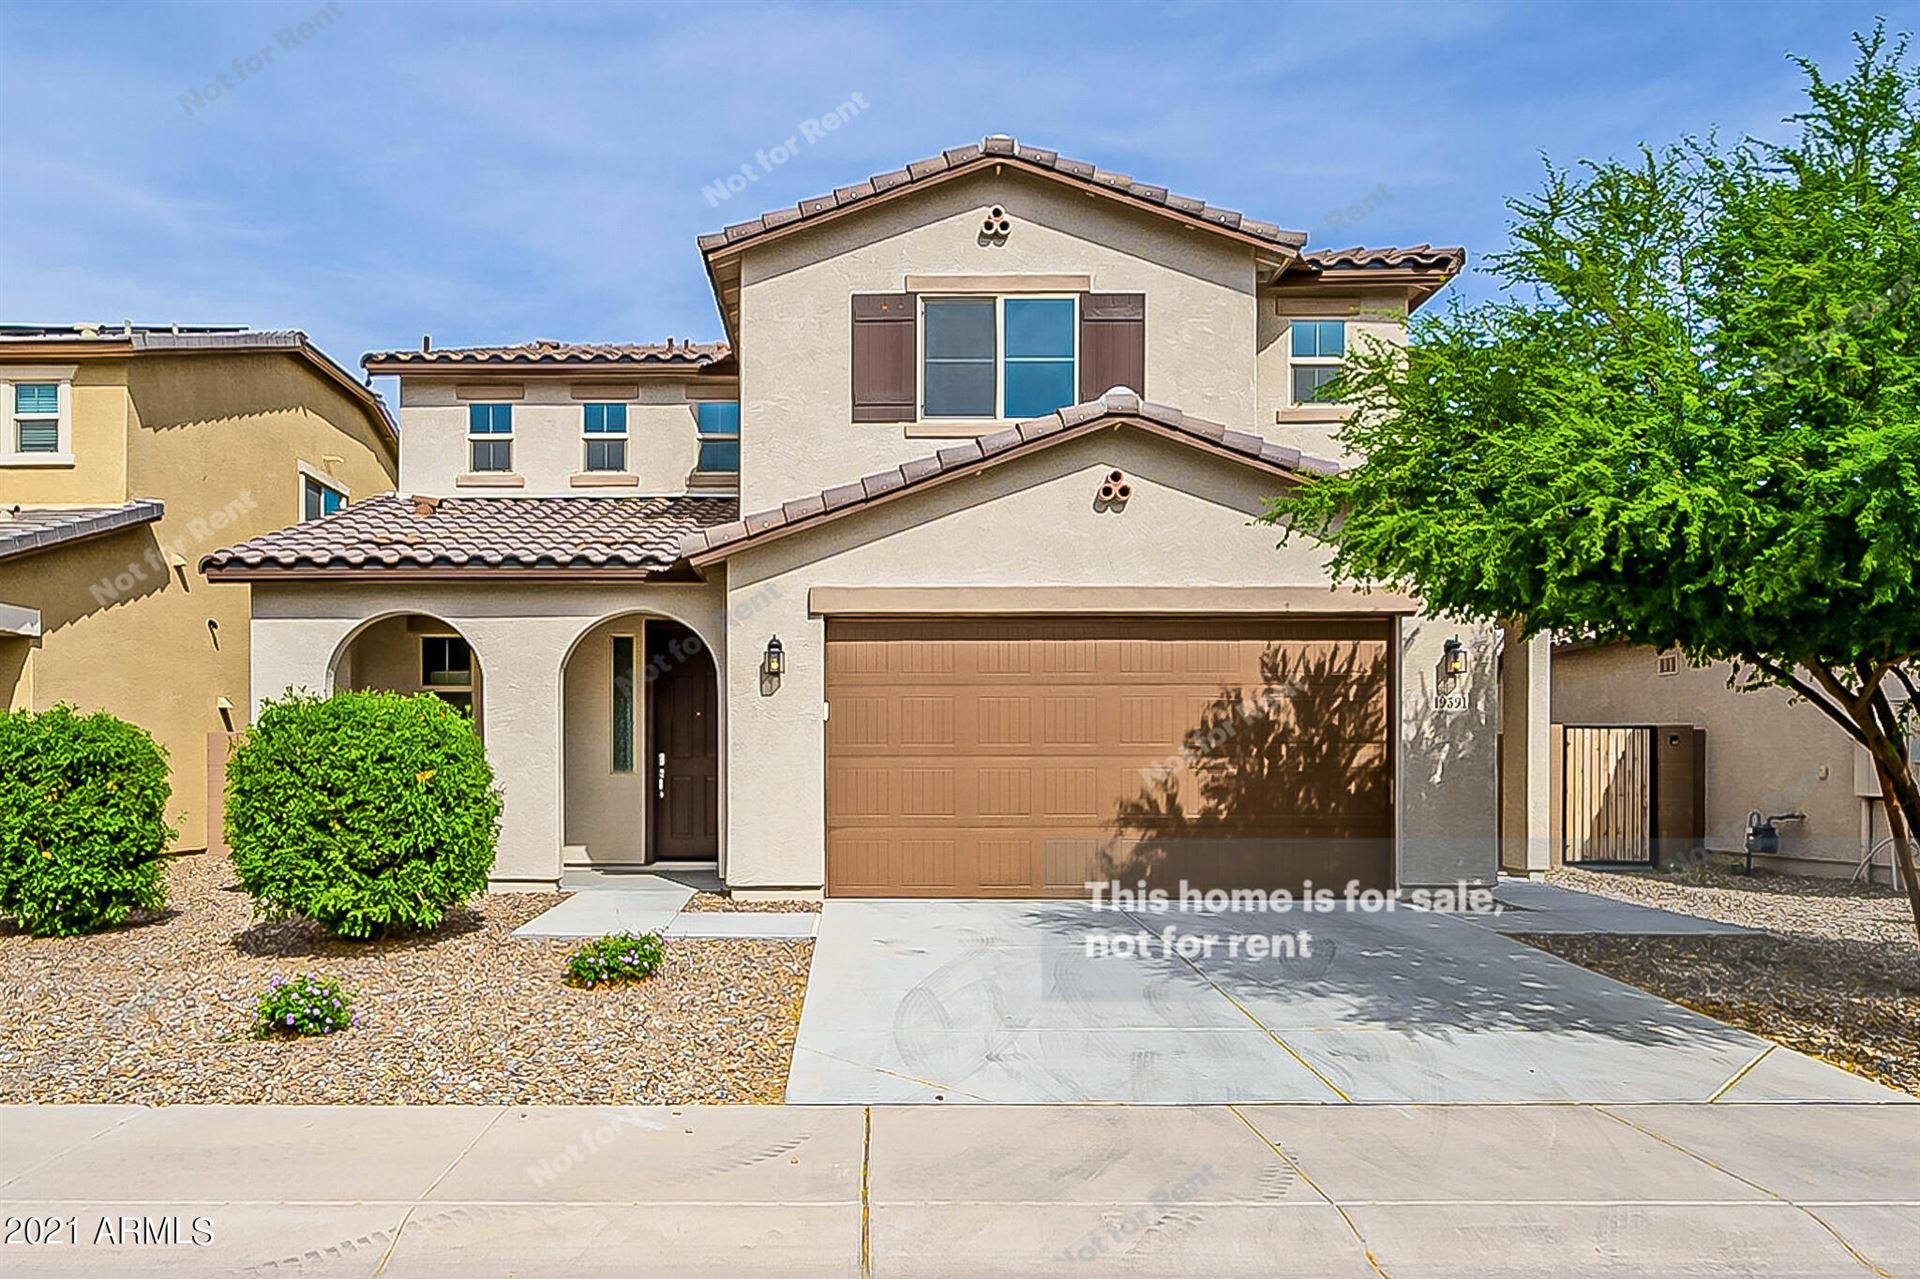 Photo for 19391 N STONEGATE Road, Maricopa, AZ 85138 (MLS # 6221975)